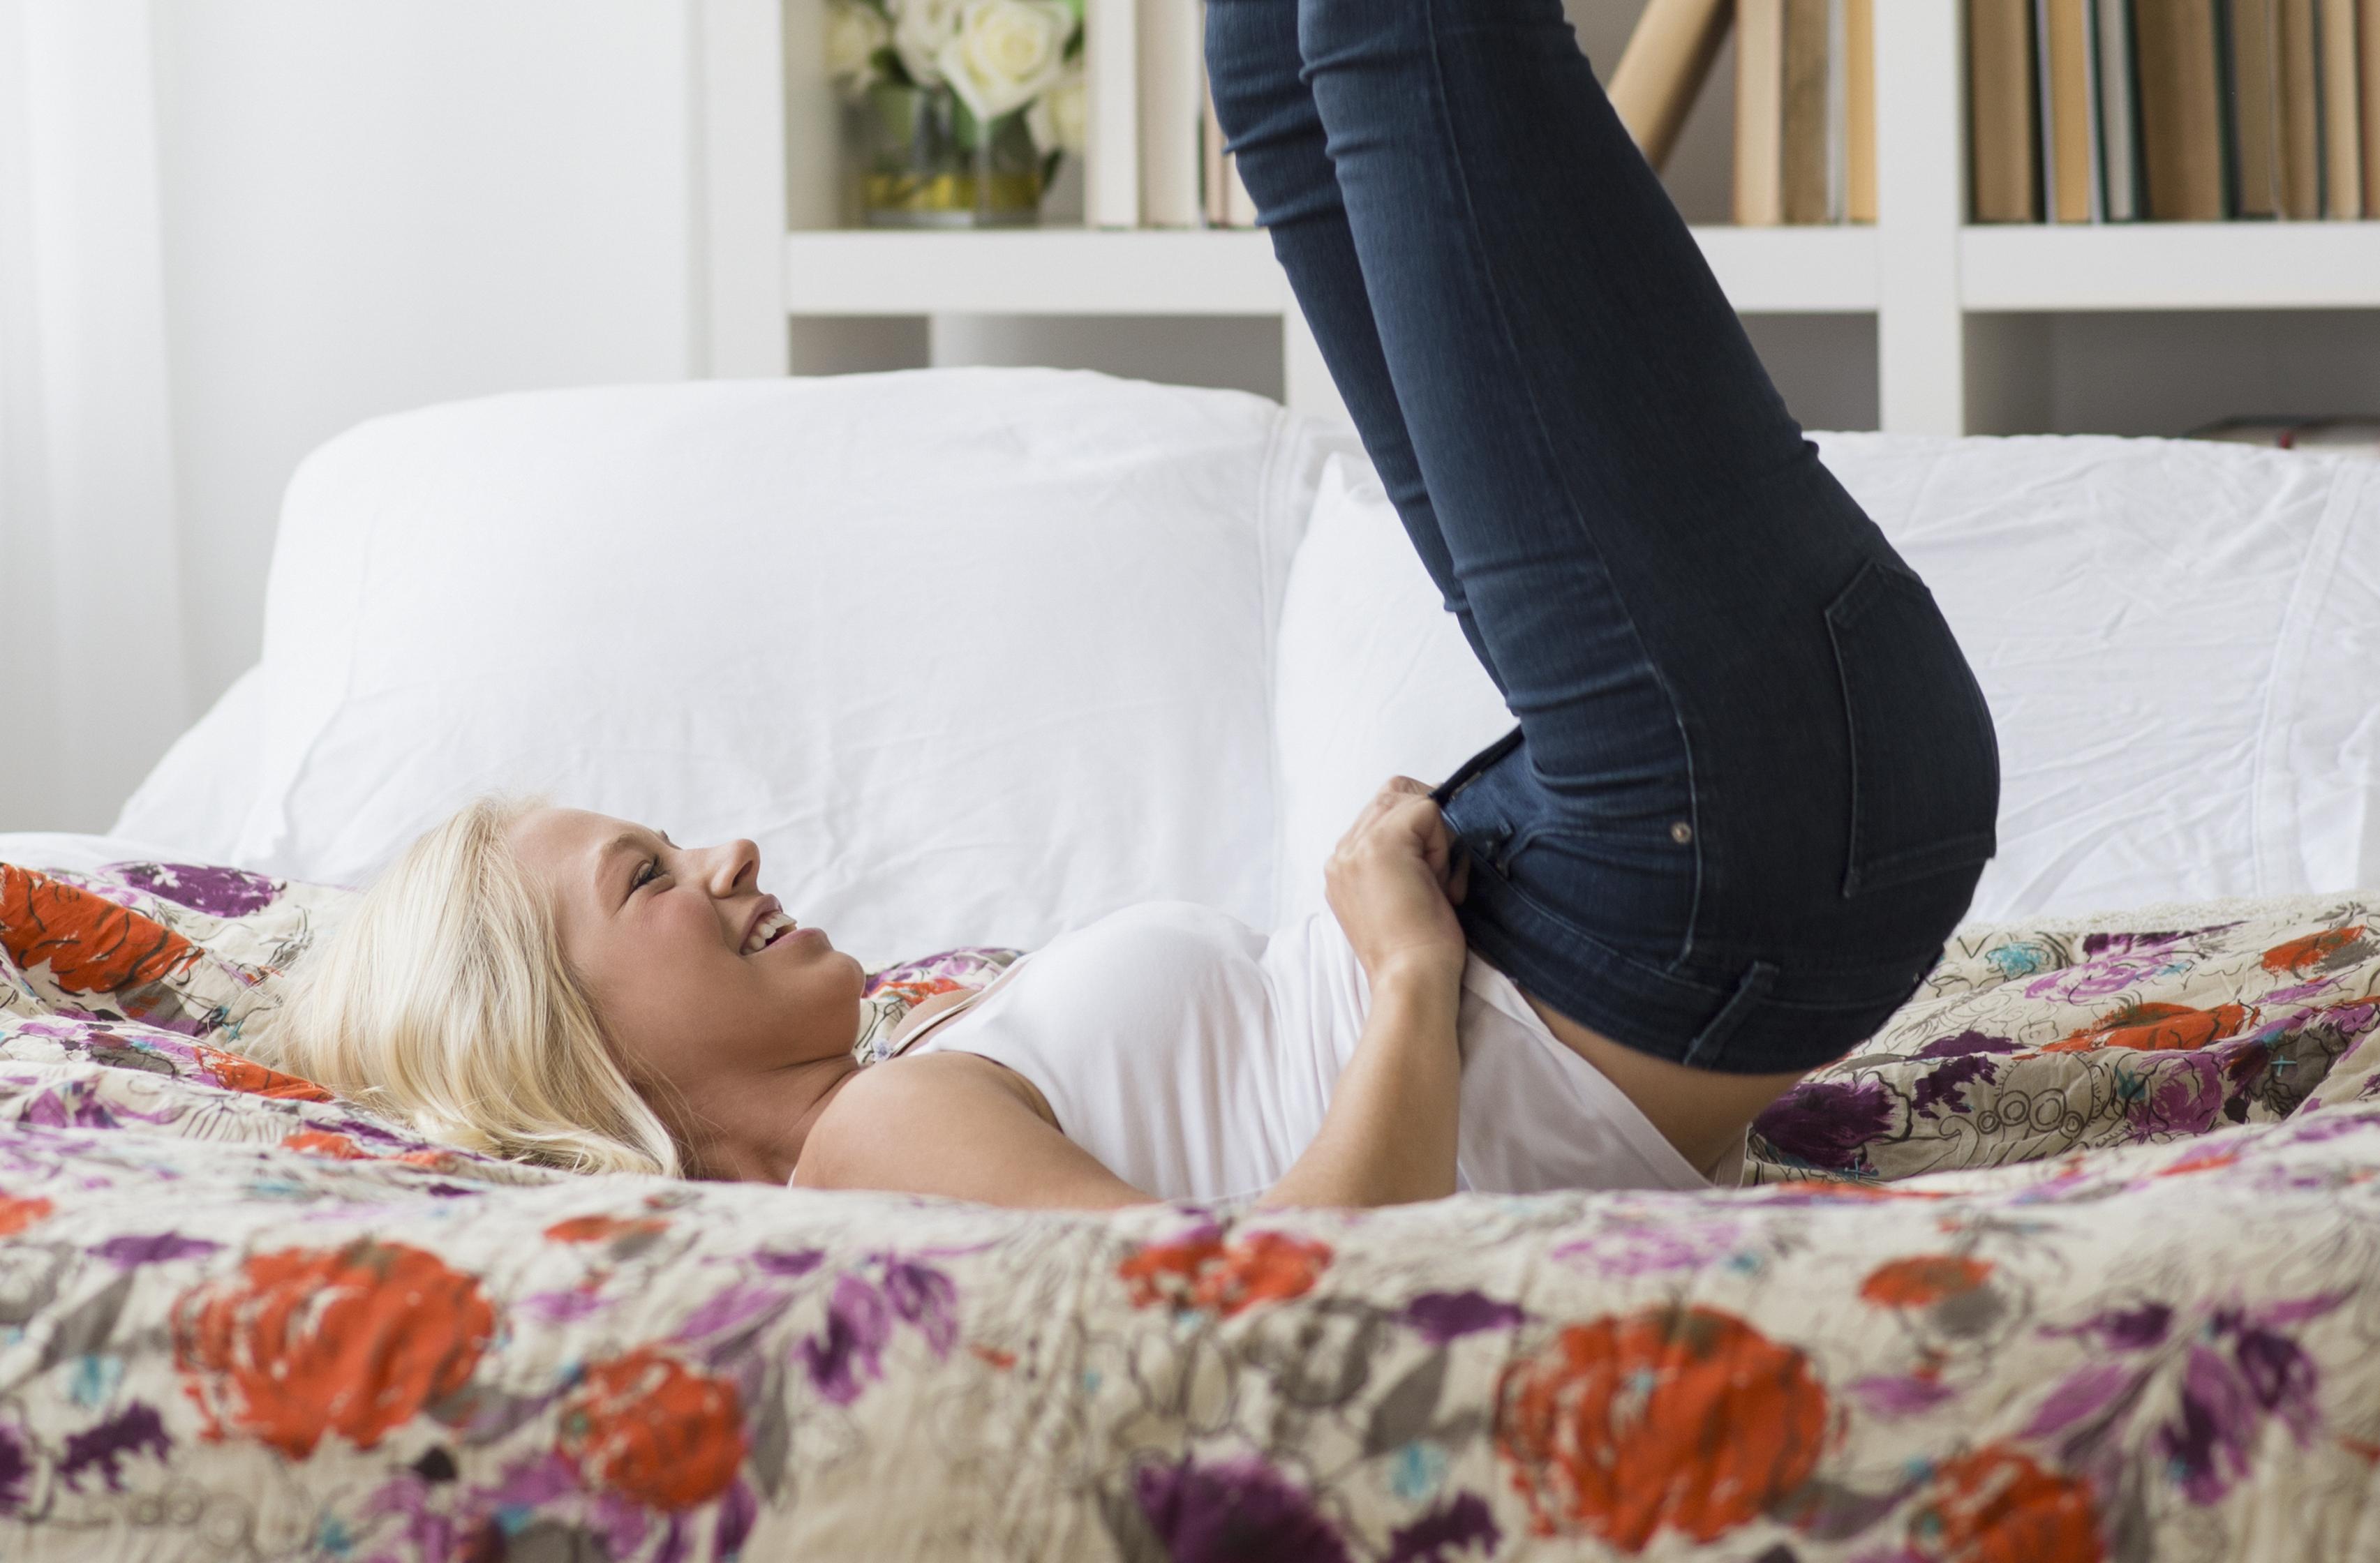 Wear why tight pants girls 9 Dangers